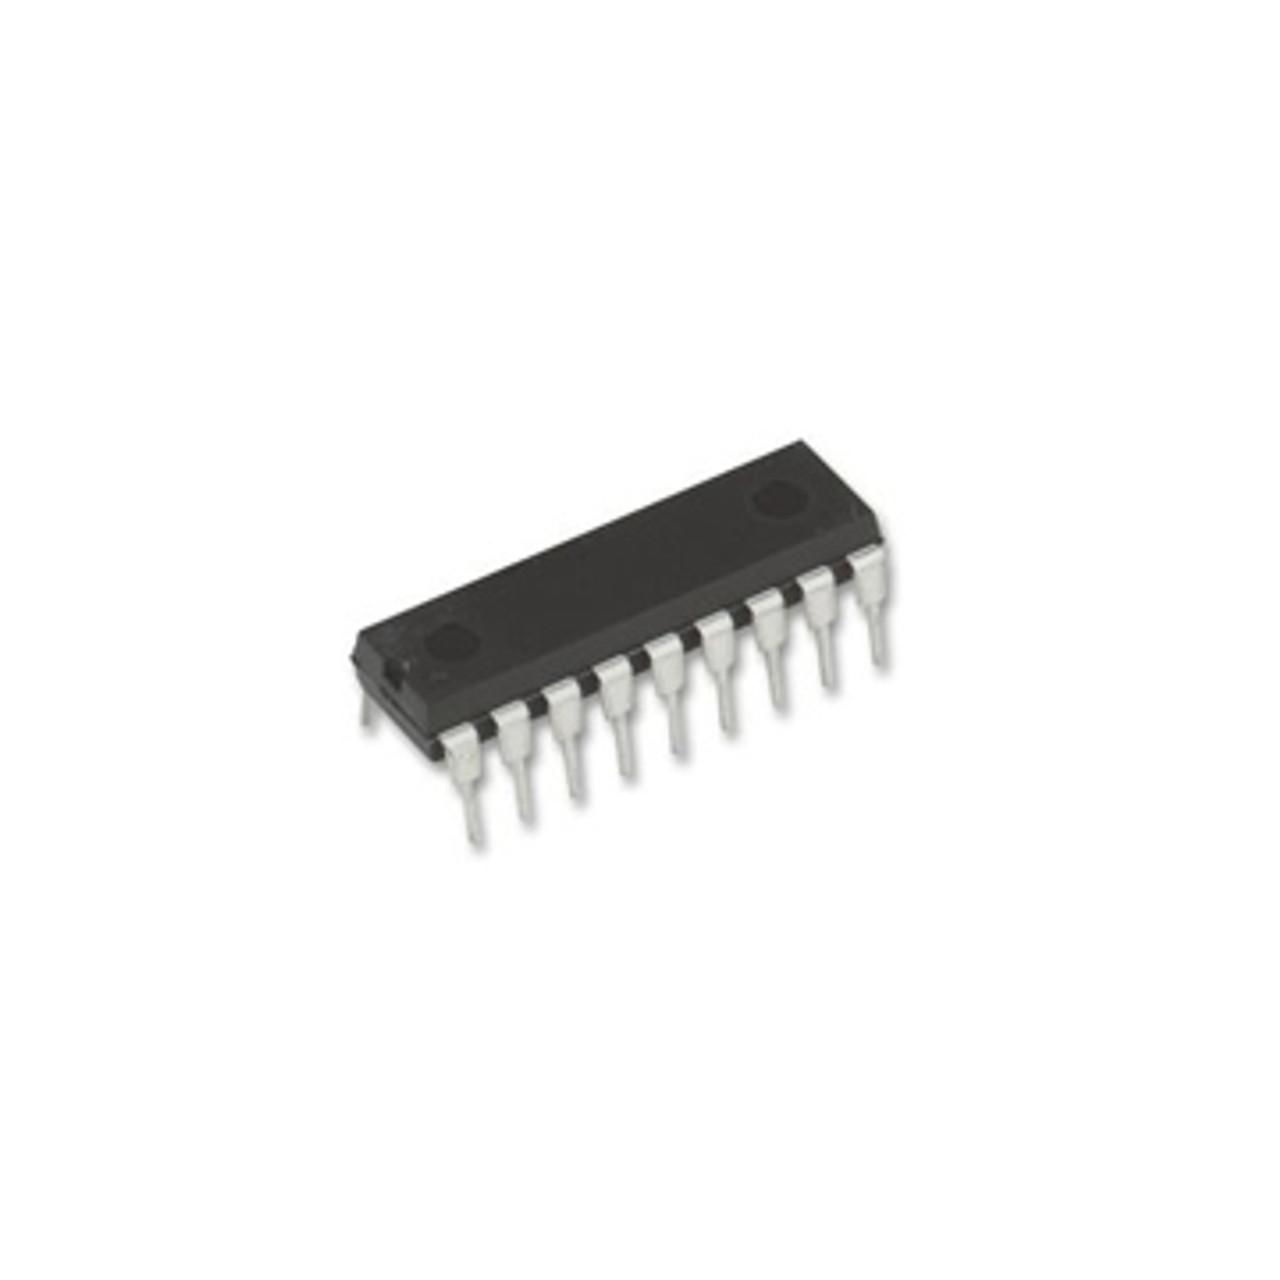 TL494CN PWM Controller IC